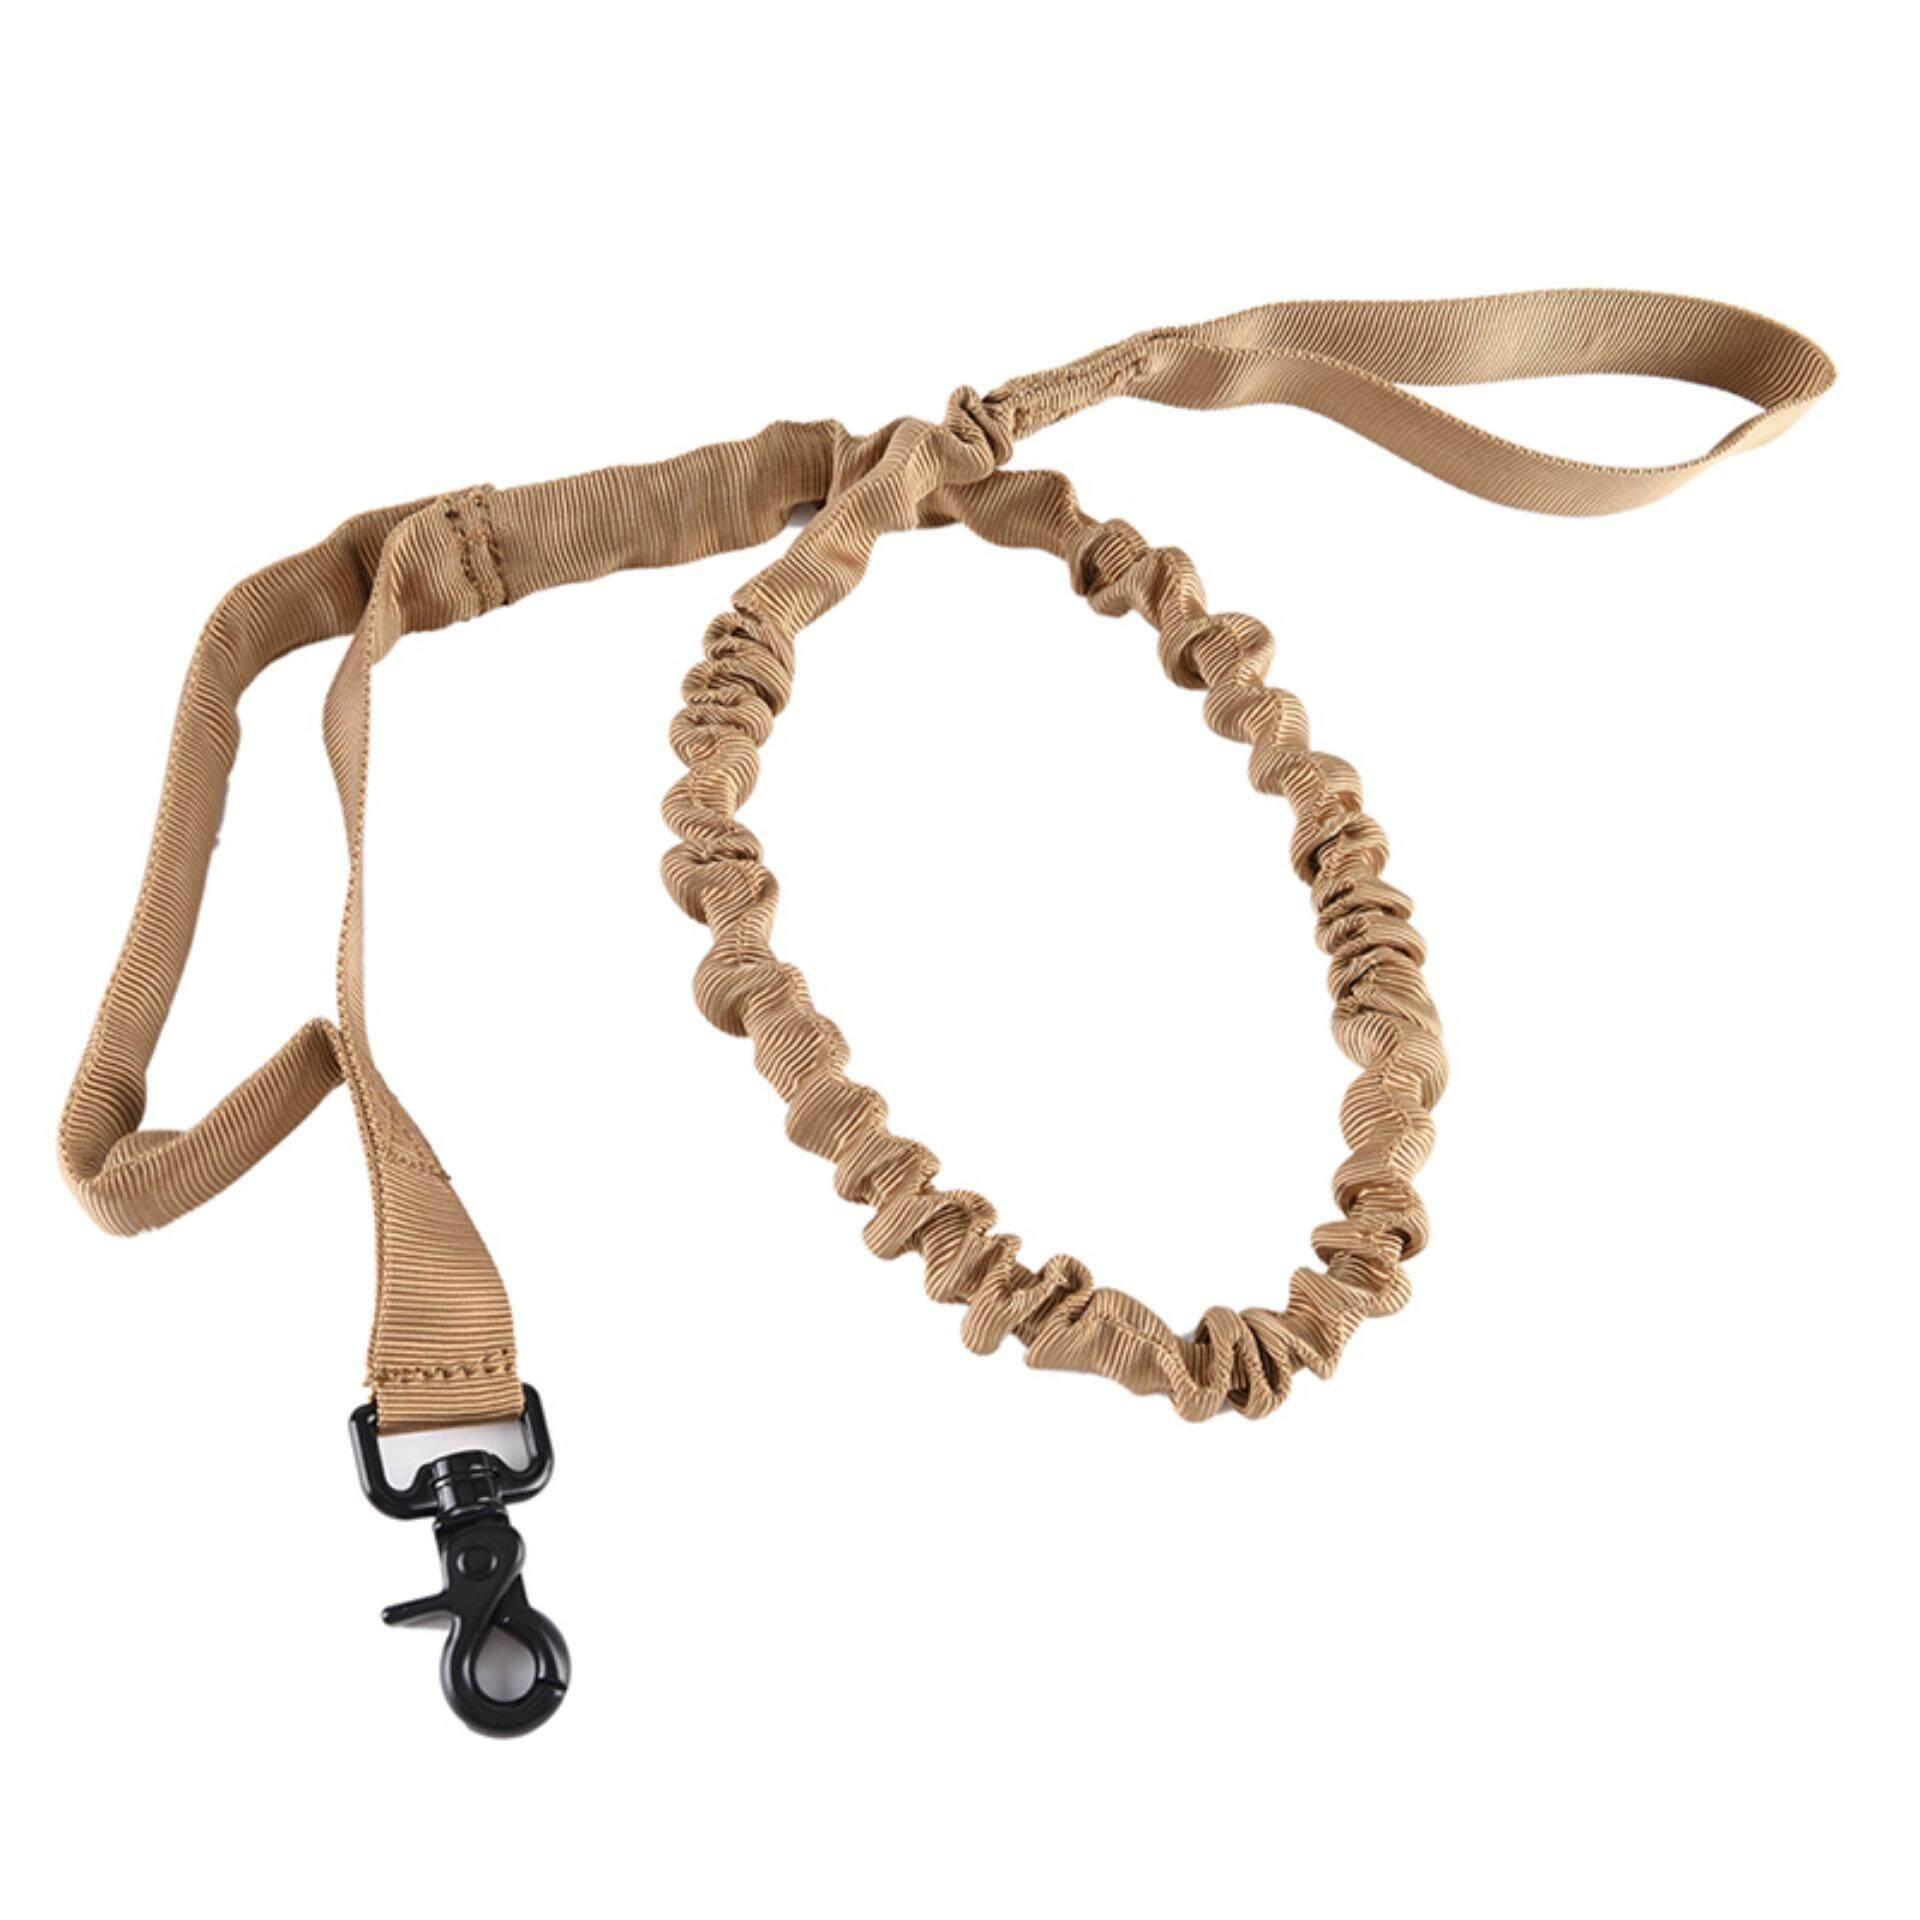 Harga Jual Police Pl14538js 03 Jam Tangan Pria Sportl Tali Kulit 14377jsb 02a Hitam Tactical Dog Training Nylon Leash Elastic Bungee Lead Usa Canine Military Khaki